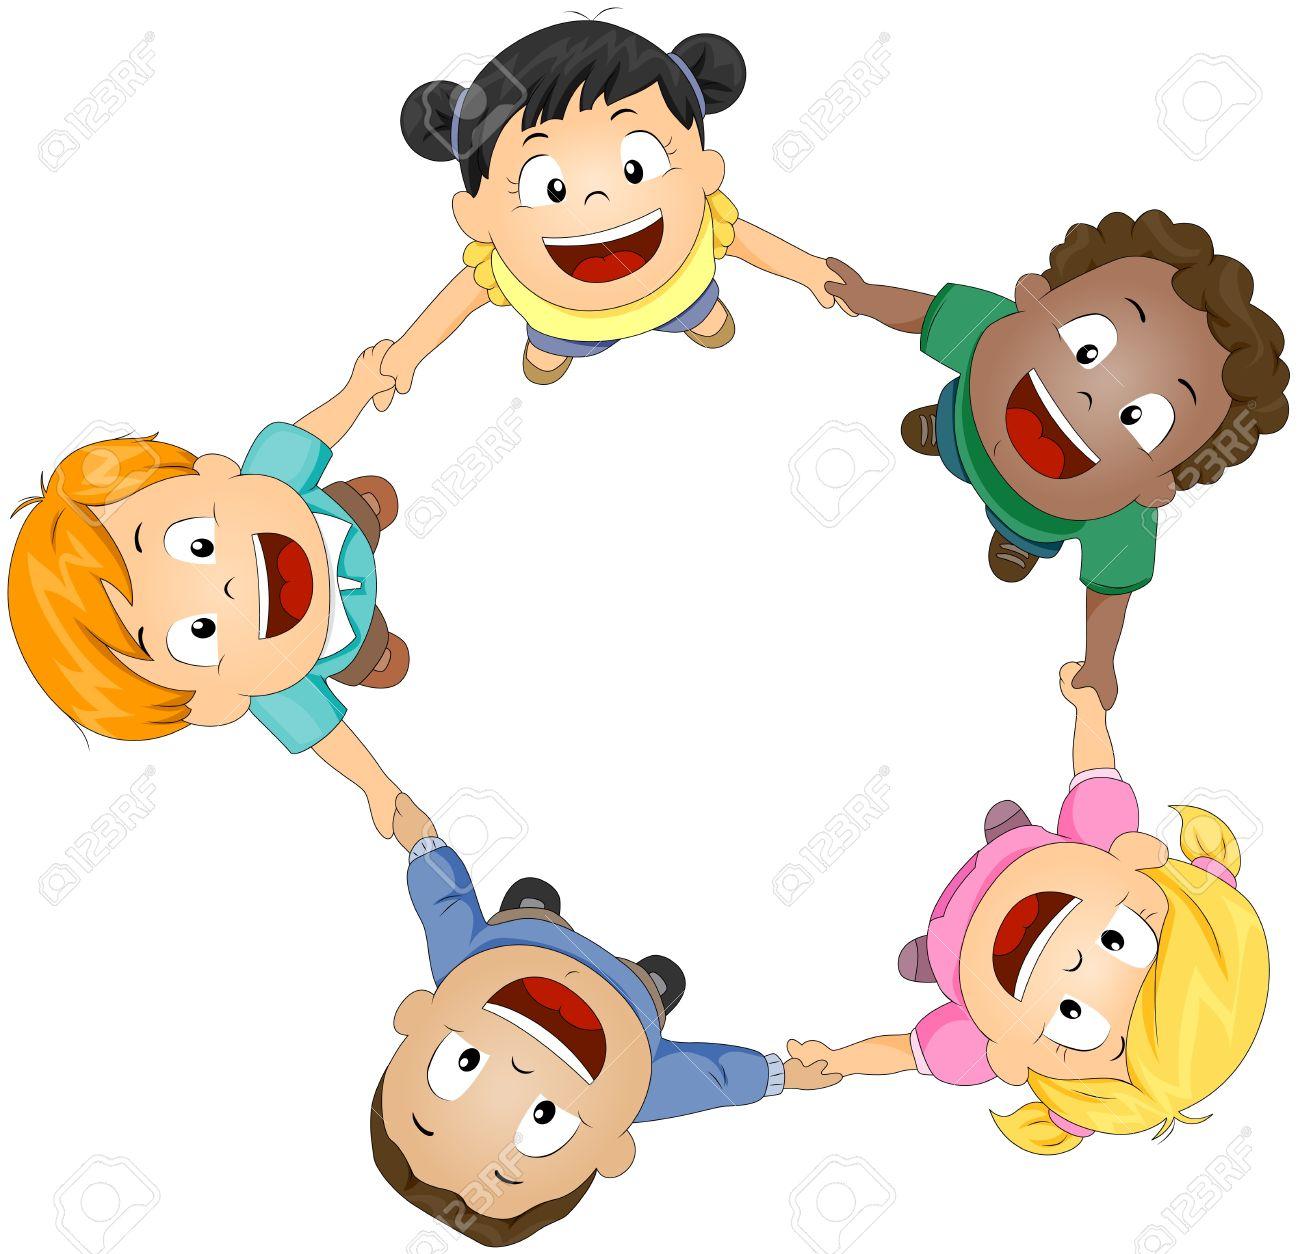 Kinderkreis clipart  Kinderkreis Clipart | mxpweb.com